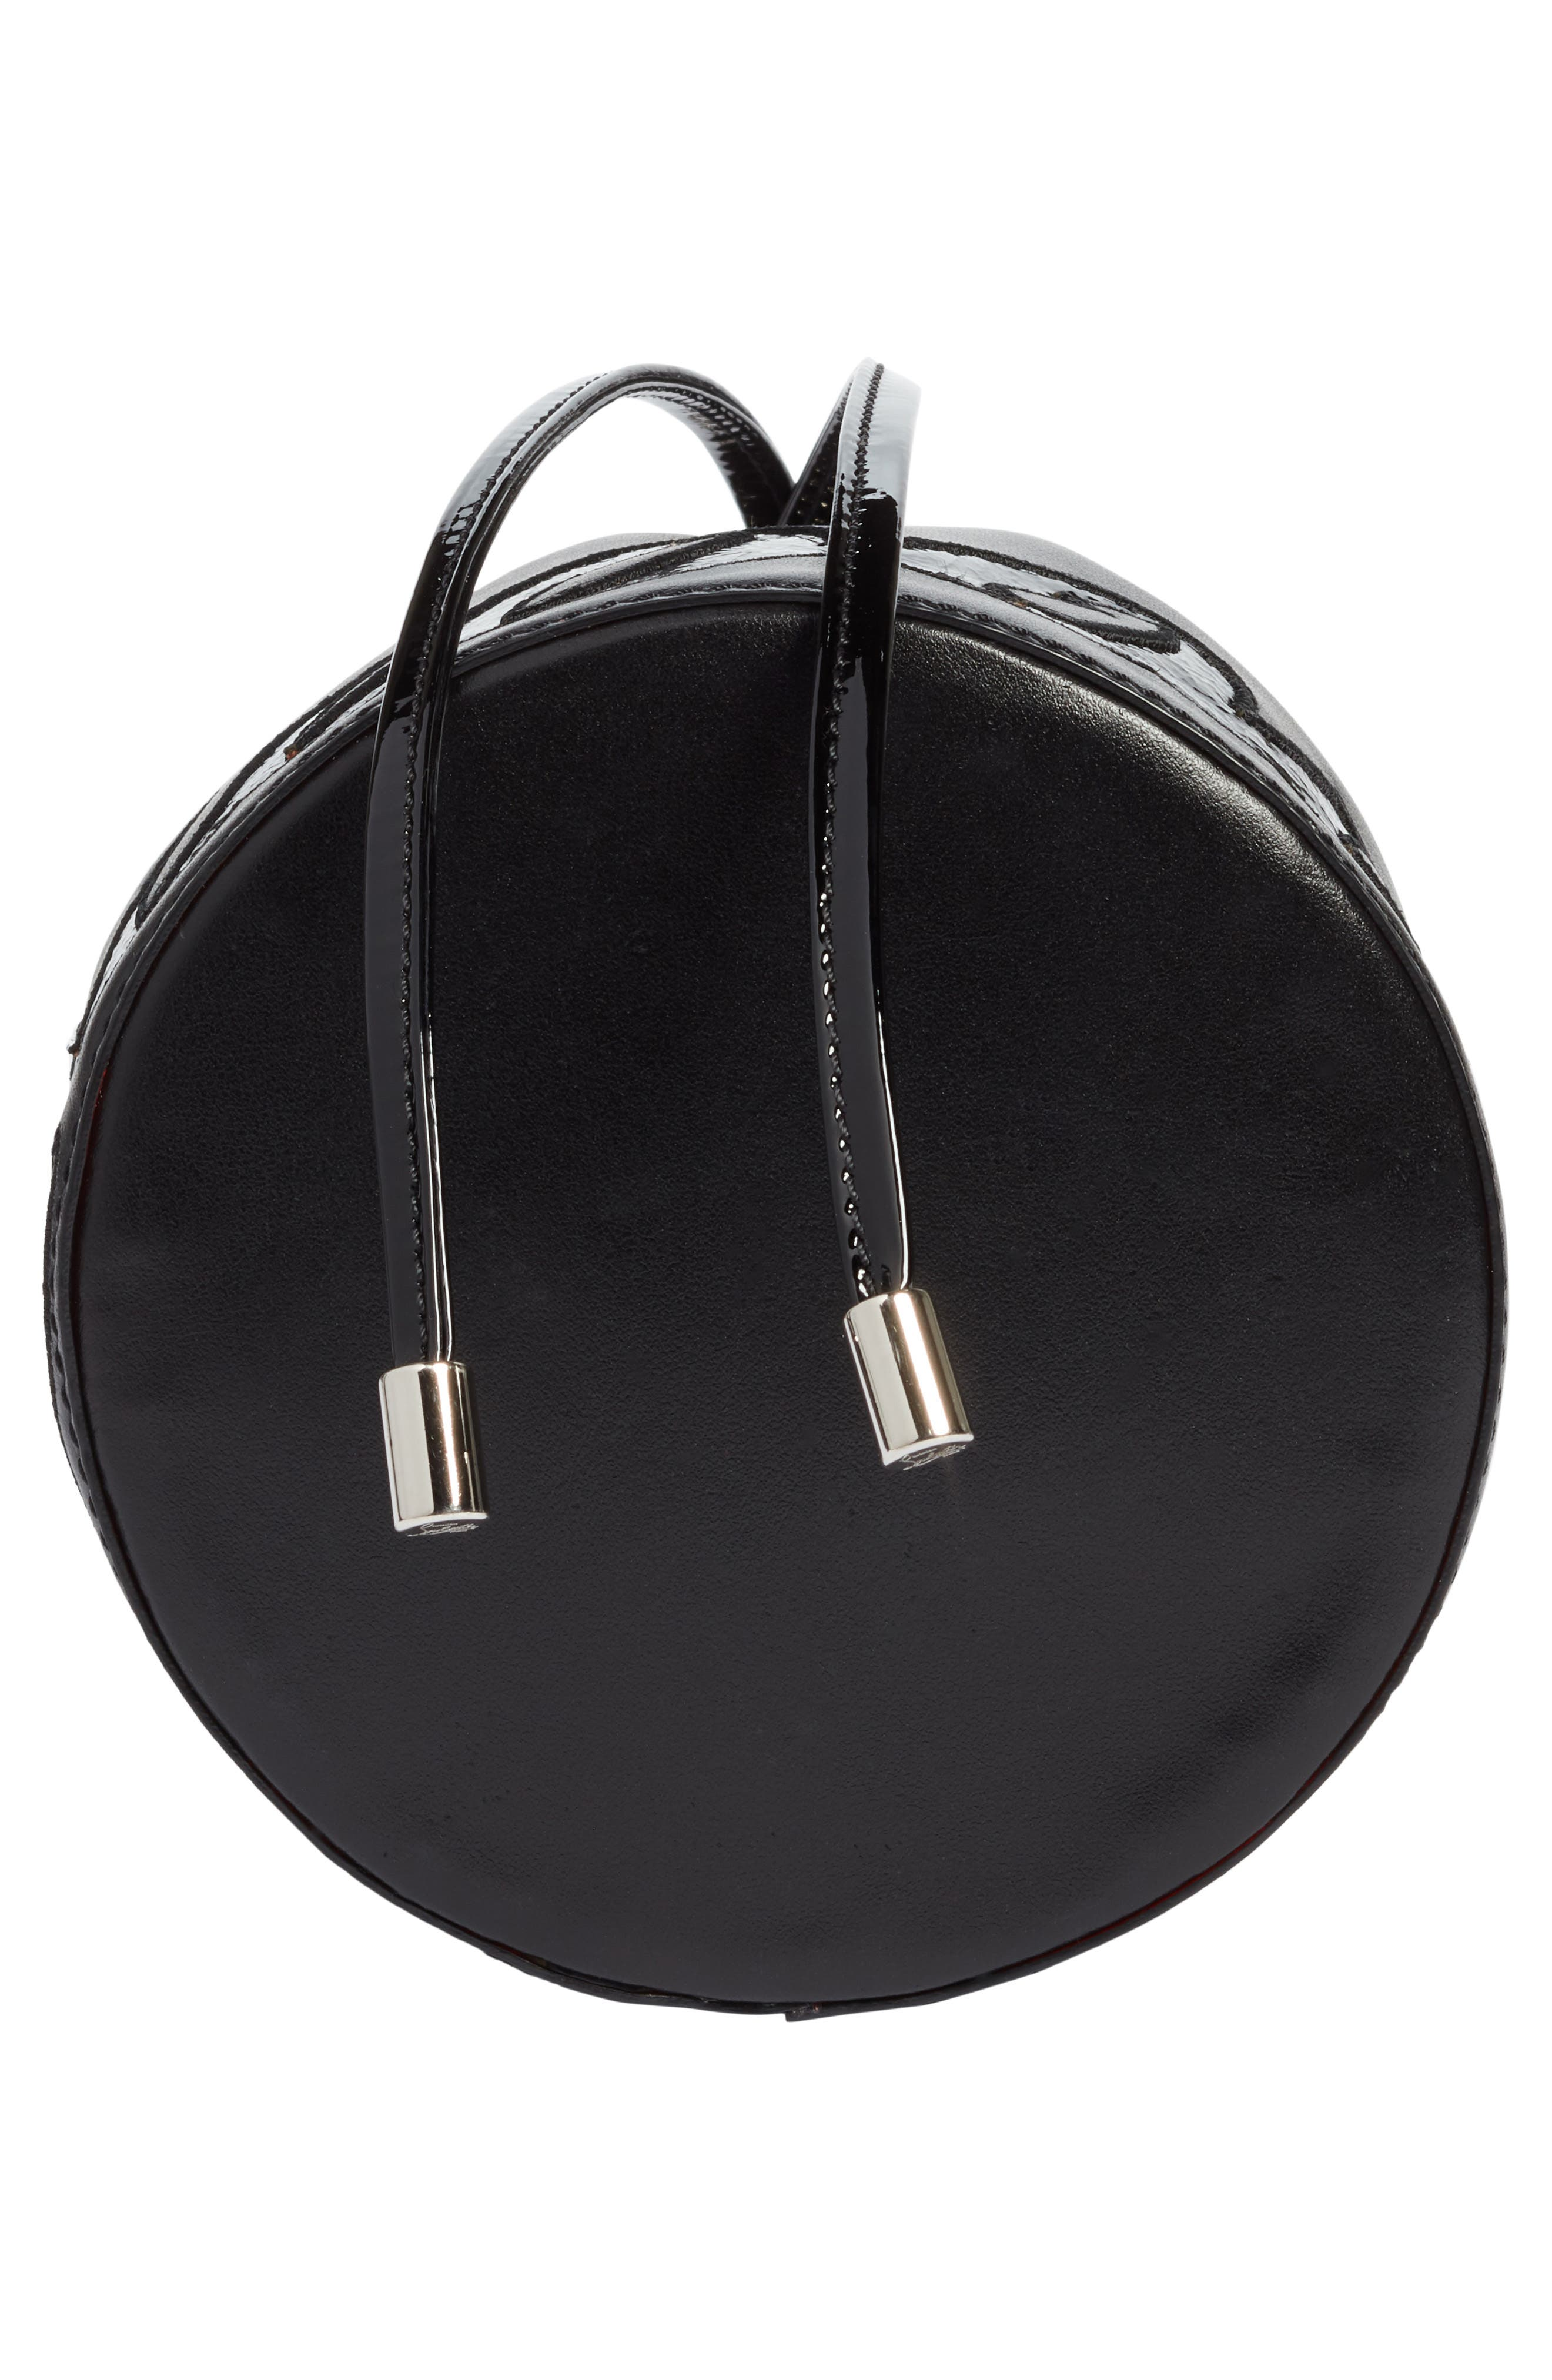 Marie Jane Calfskin Bucket Bag,                             Alternate thumbnail 5, color,                             BLACK/ BLACK